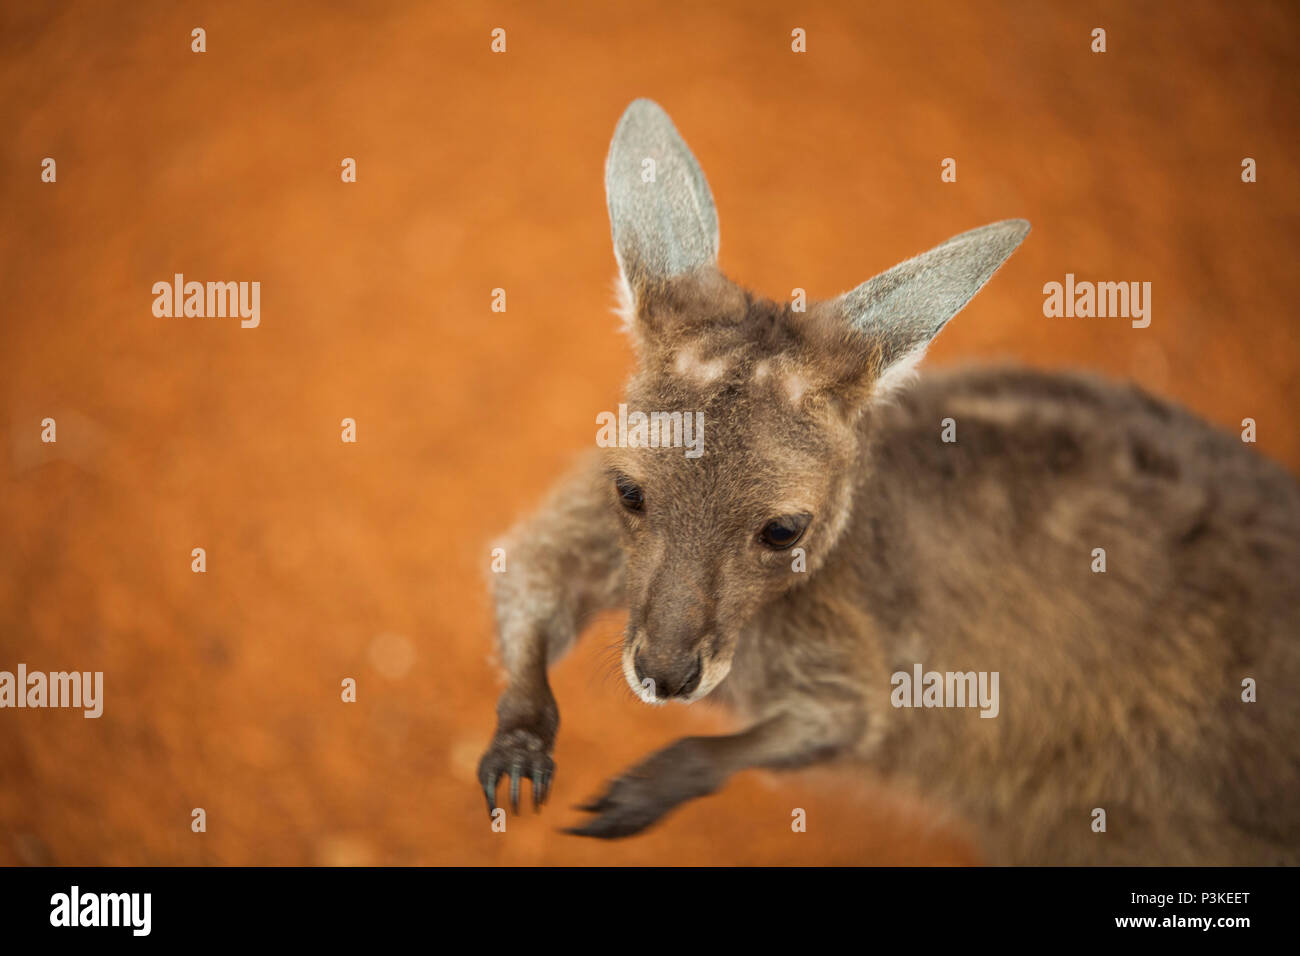 Baby Kangaroo (Joey), Perth, Western Australia Zoo Stockbild